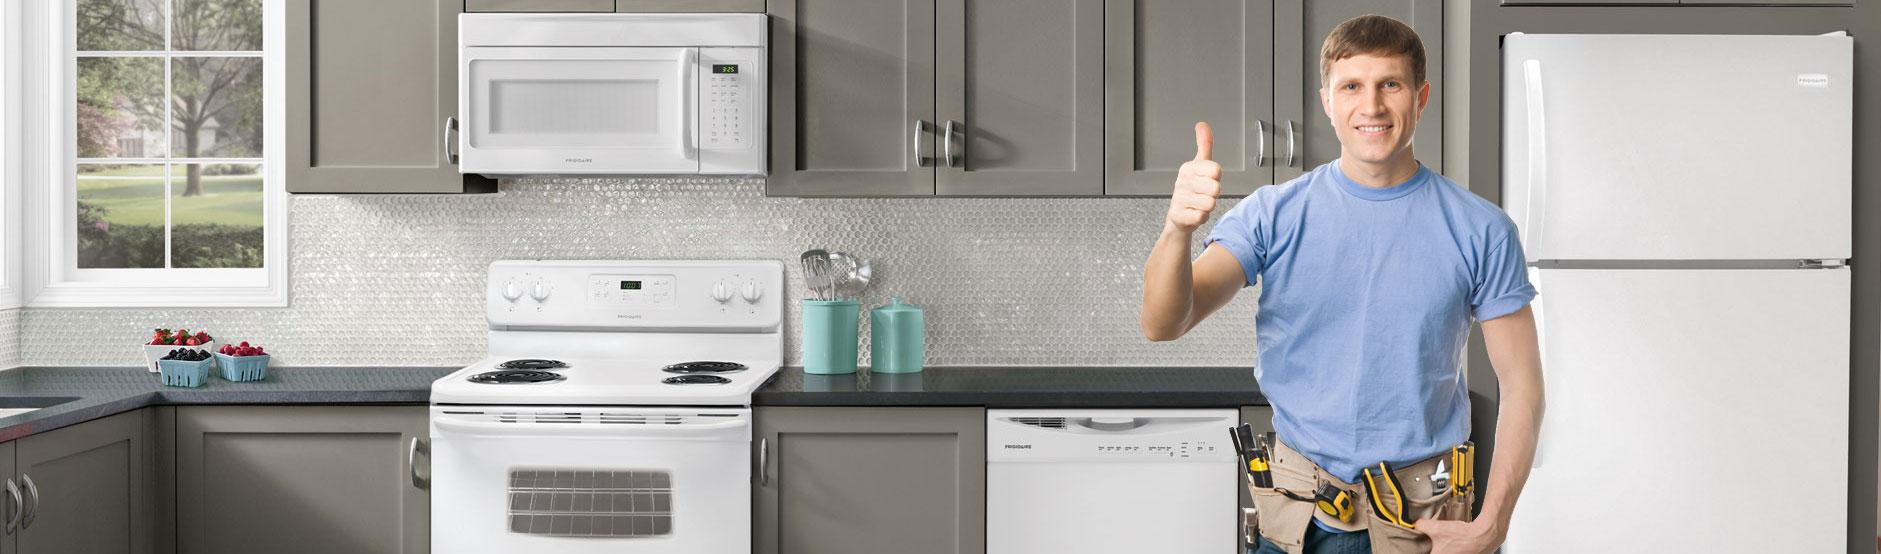 Appliance Repair El Cajon Refrigerator Premier Appliance